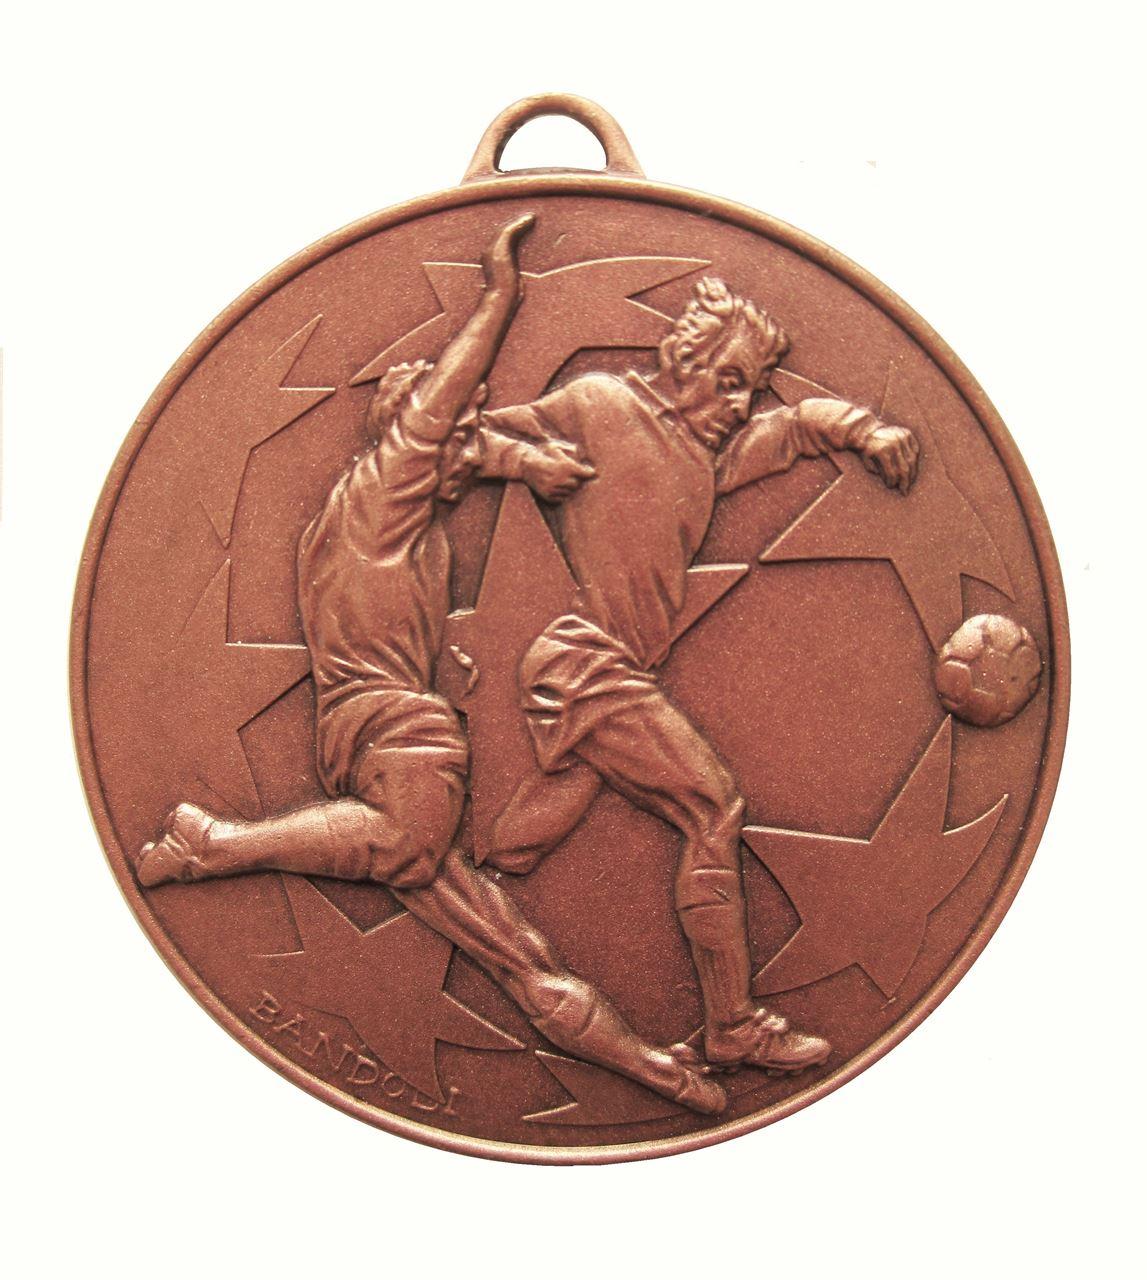 Copper Economy Football Stars Medal (size: 50mm) - 437E